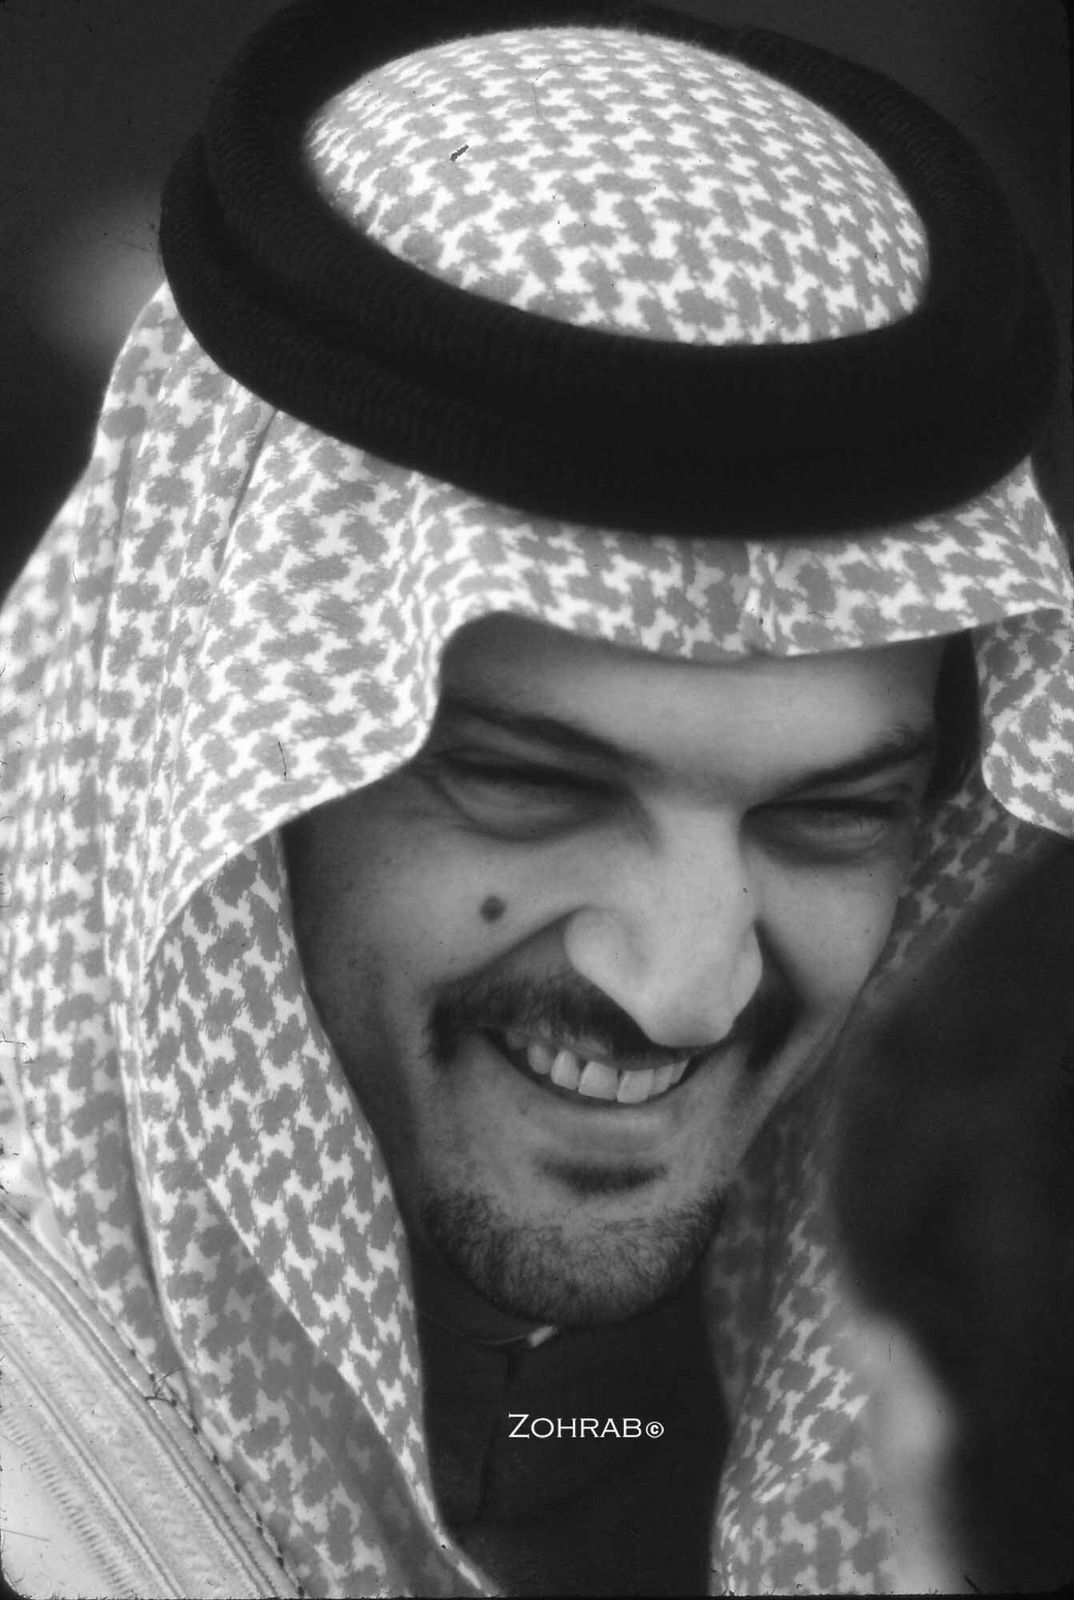 Pin By Nouf Abdulaziz On Handsome Men Saudi Men Arab Men Fashion Arab Men